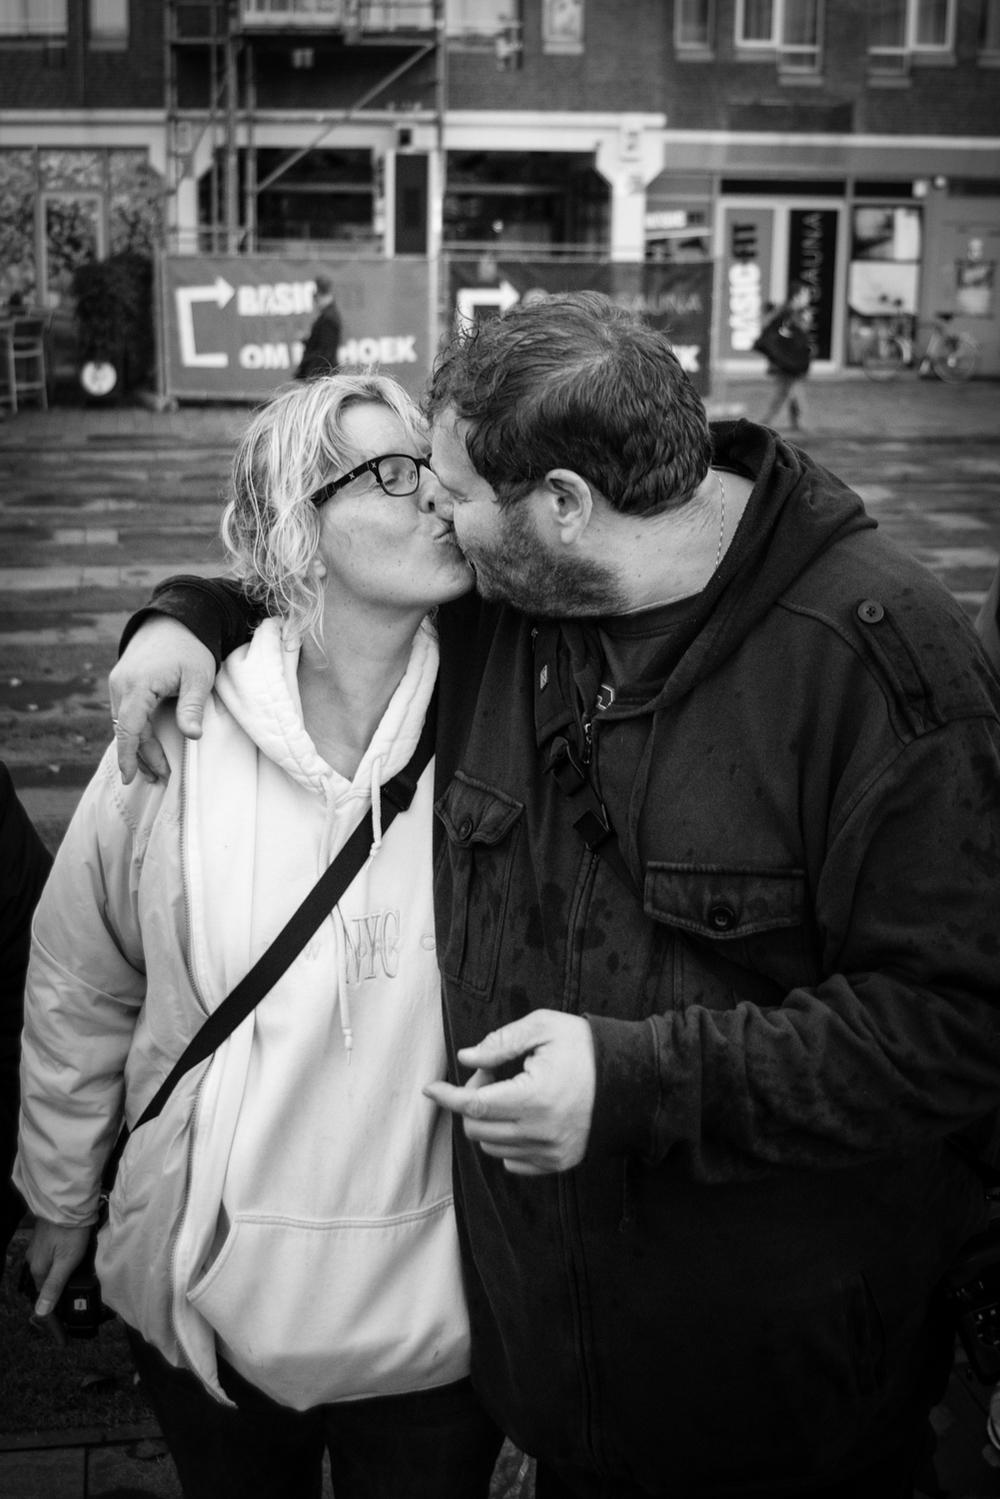 fotowalk_tilburg-62.jpg